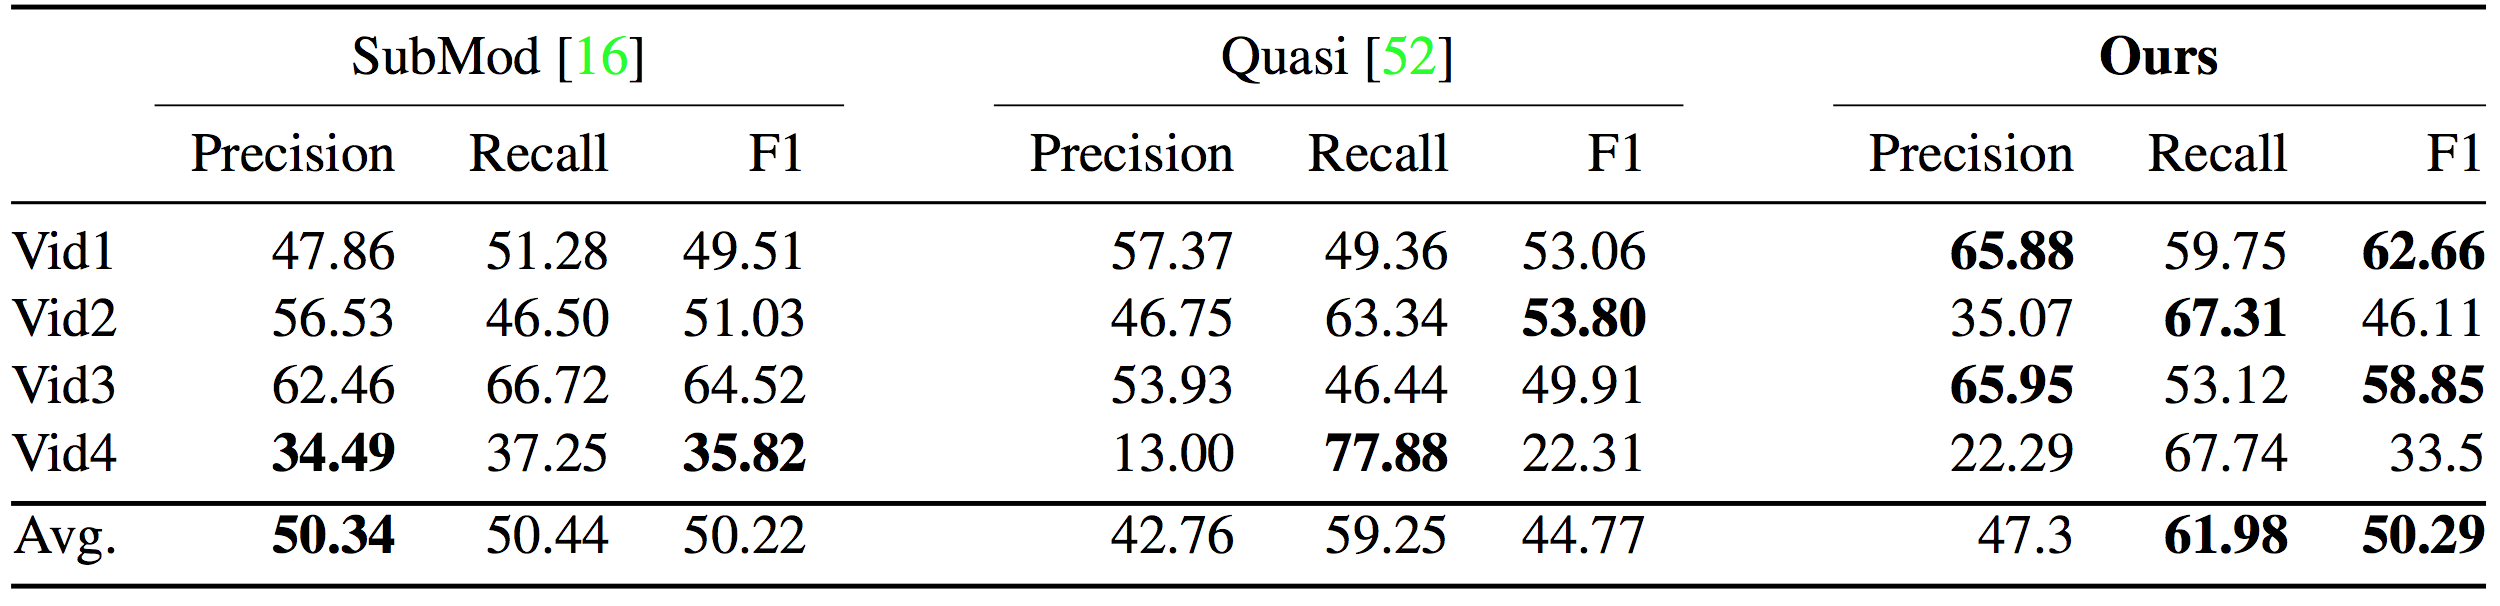 Comparison results for generic video summarization, i.e., when no video shots are relevant to the query